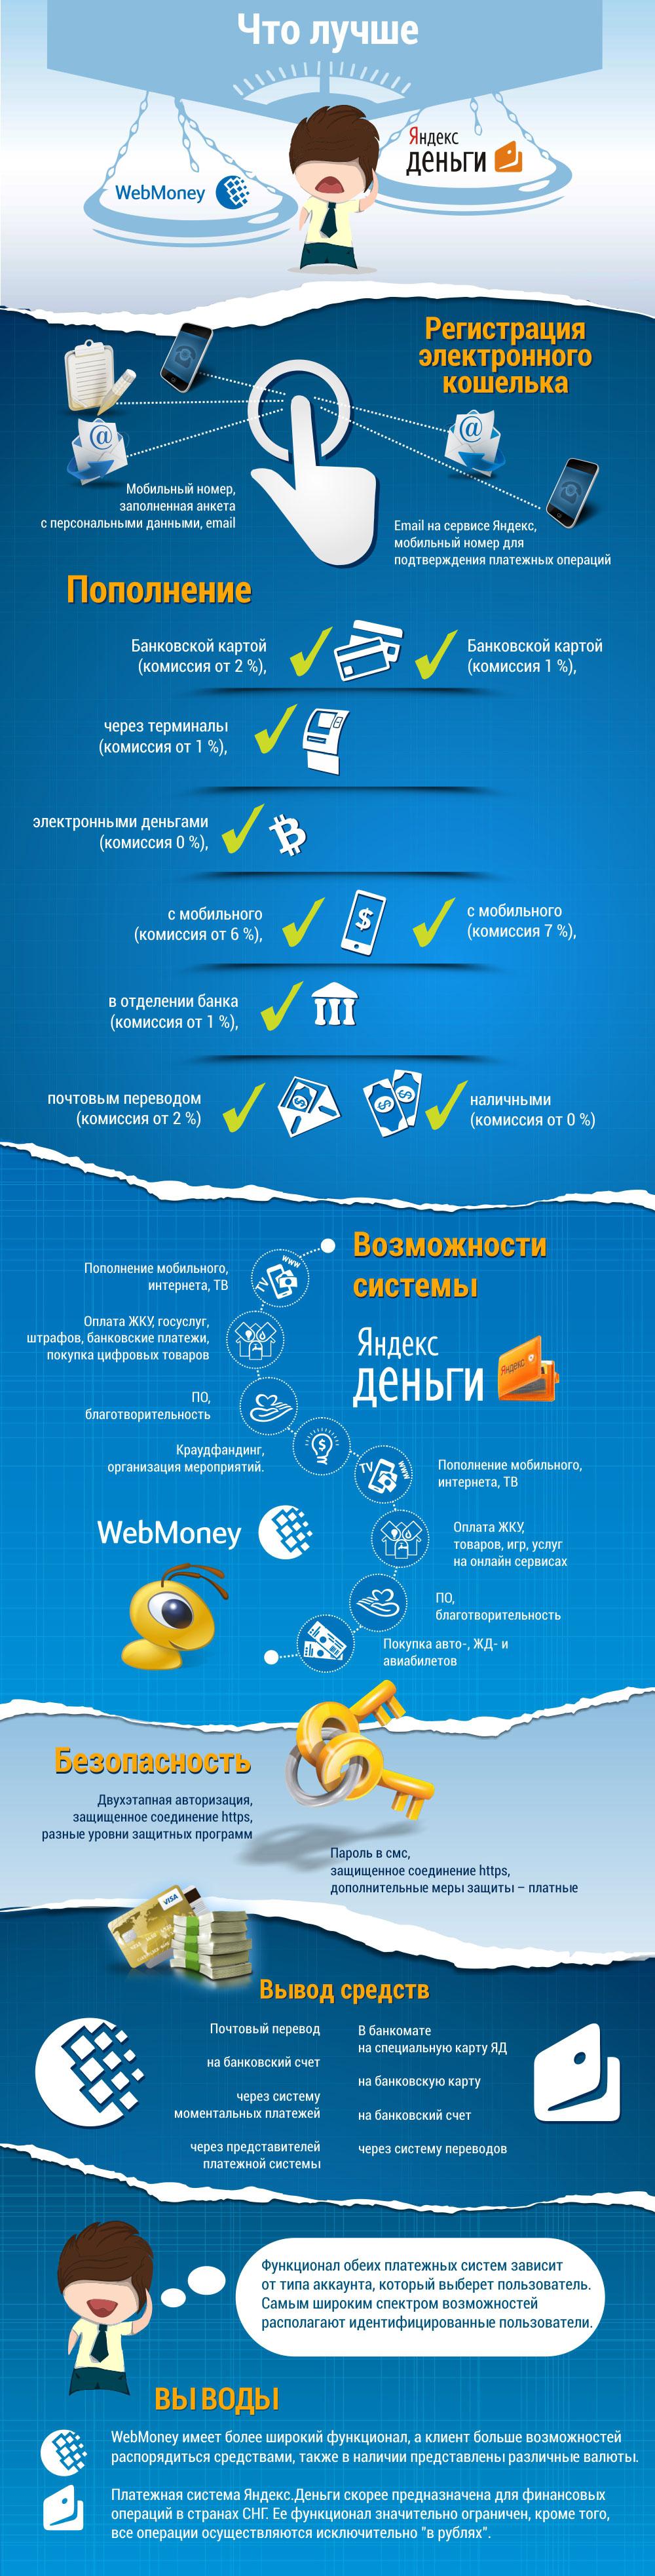 Webmoney или Яндекс.Деньги?